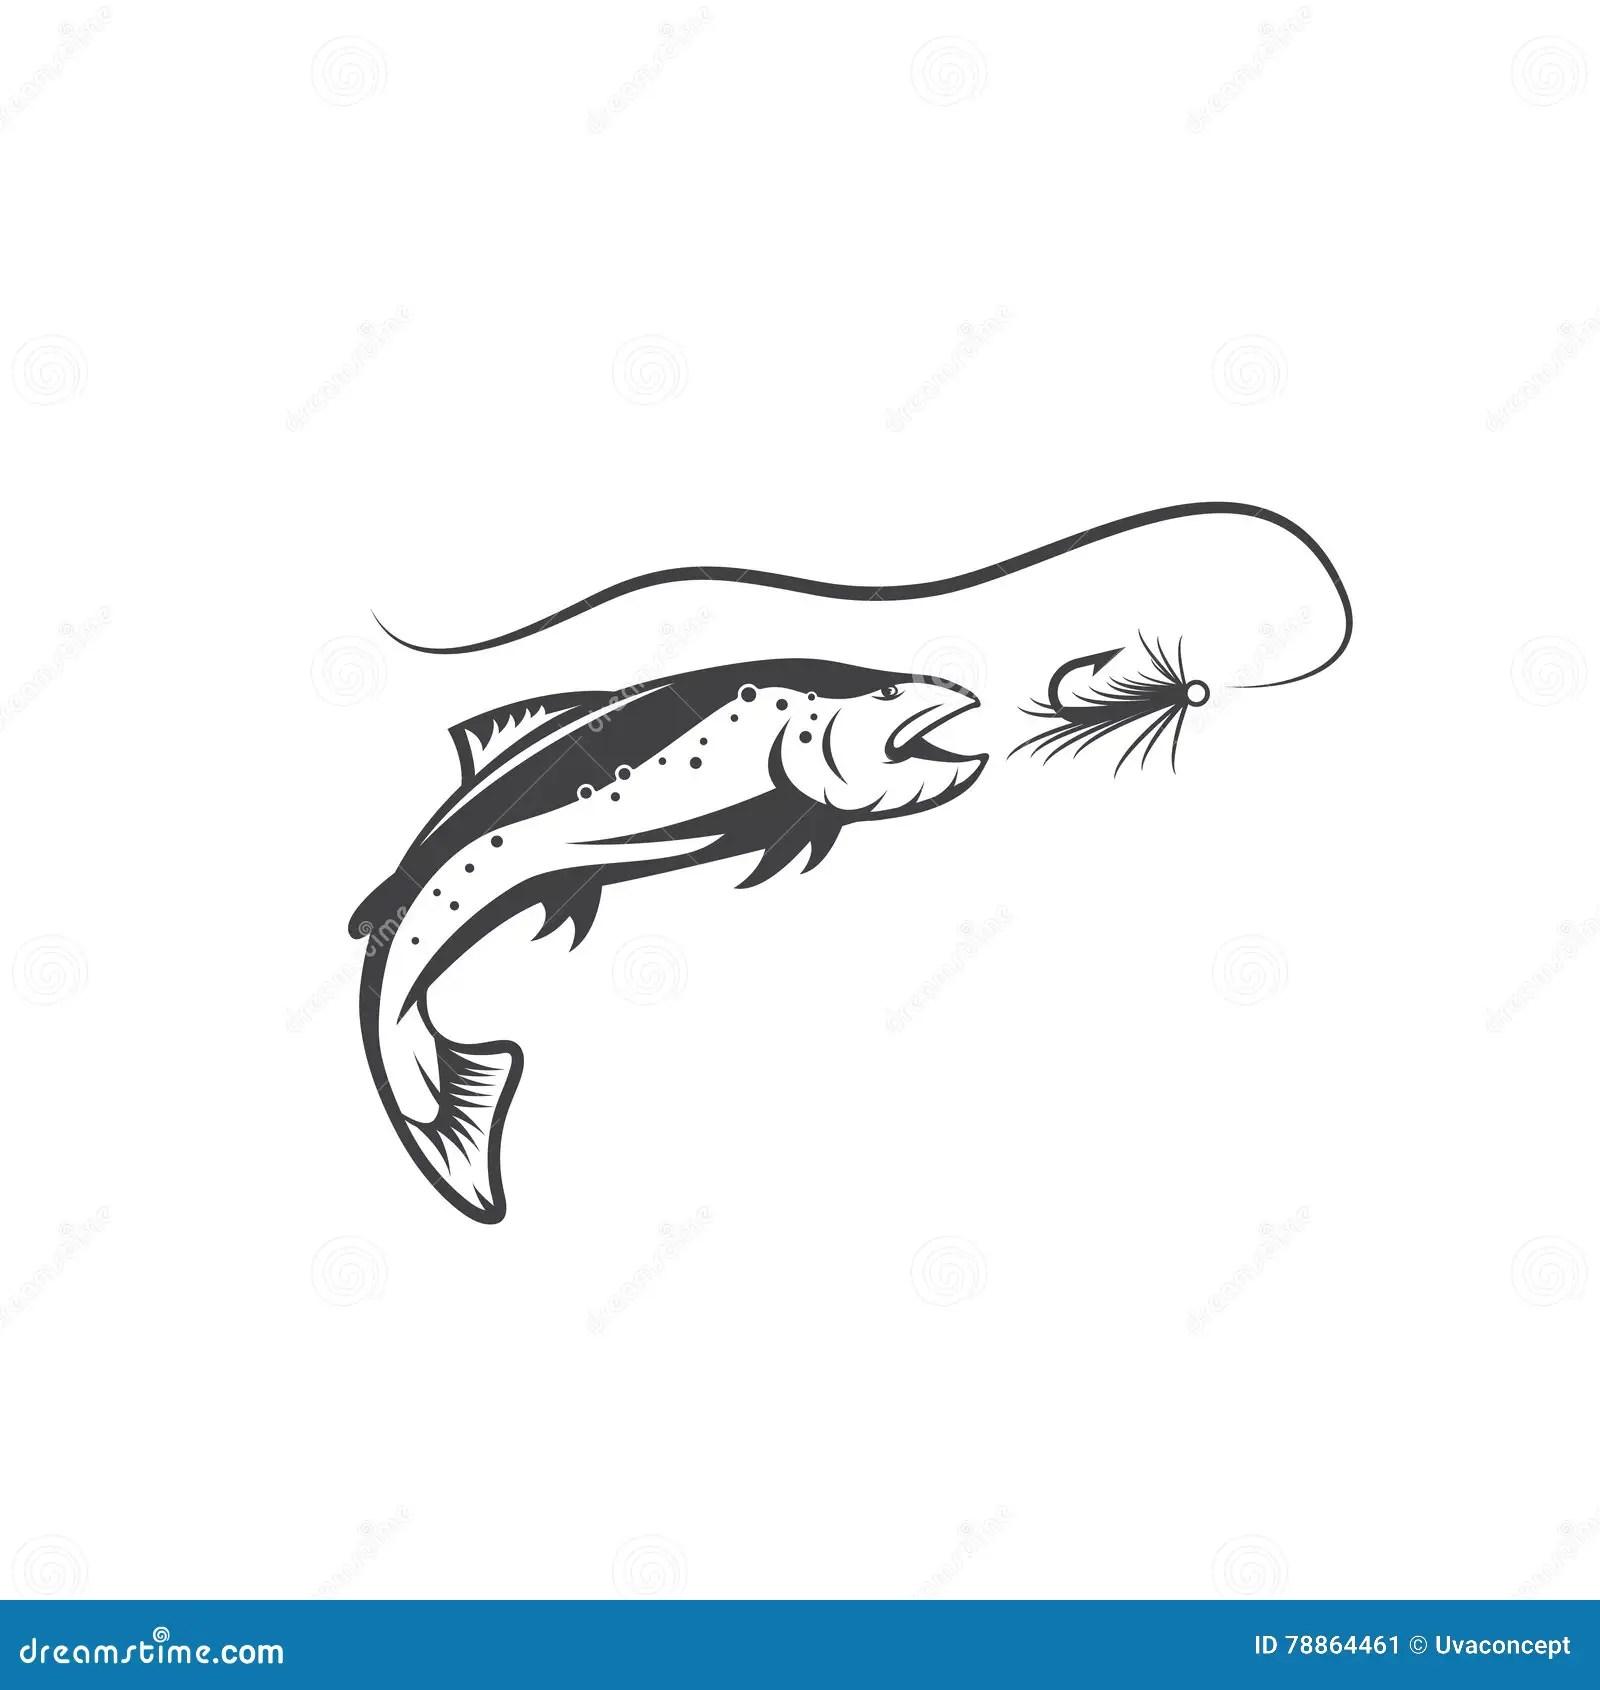 Salmon Fish And Lure Vector Design Stock Vector